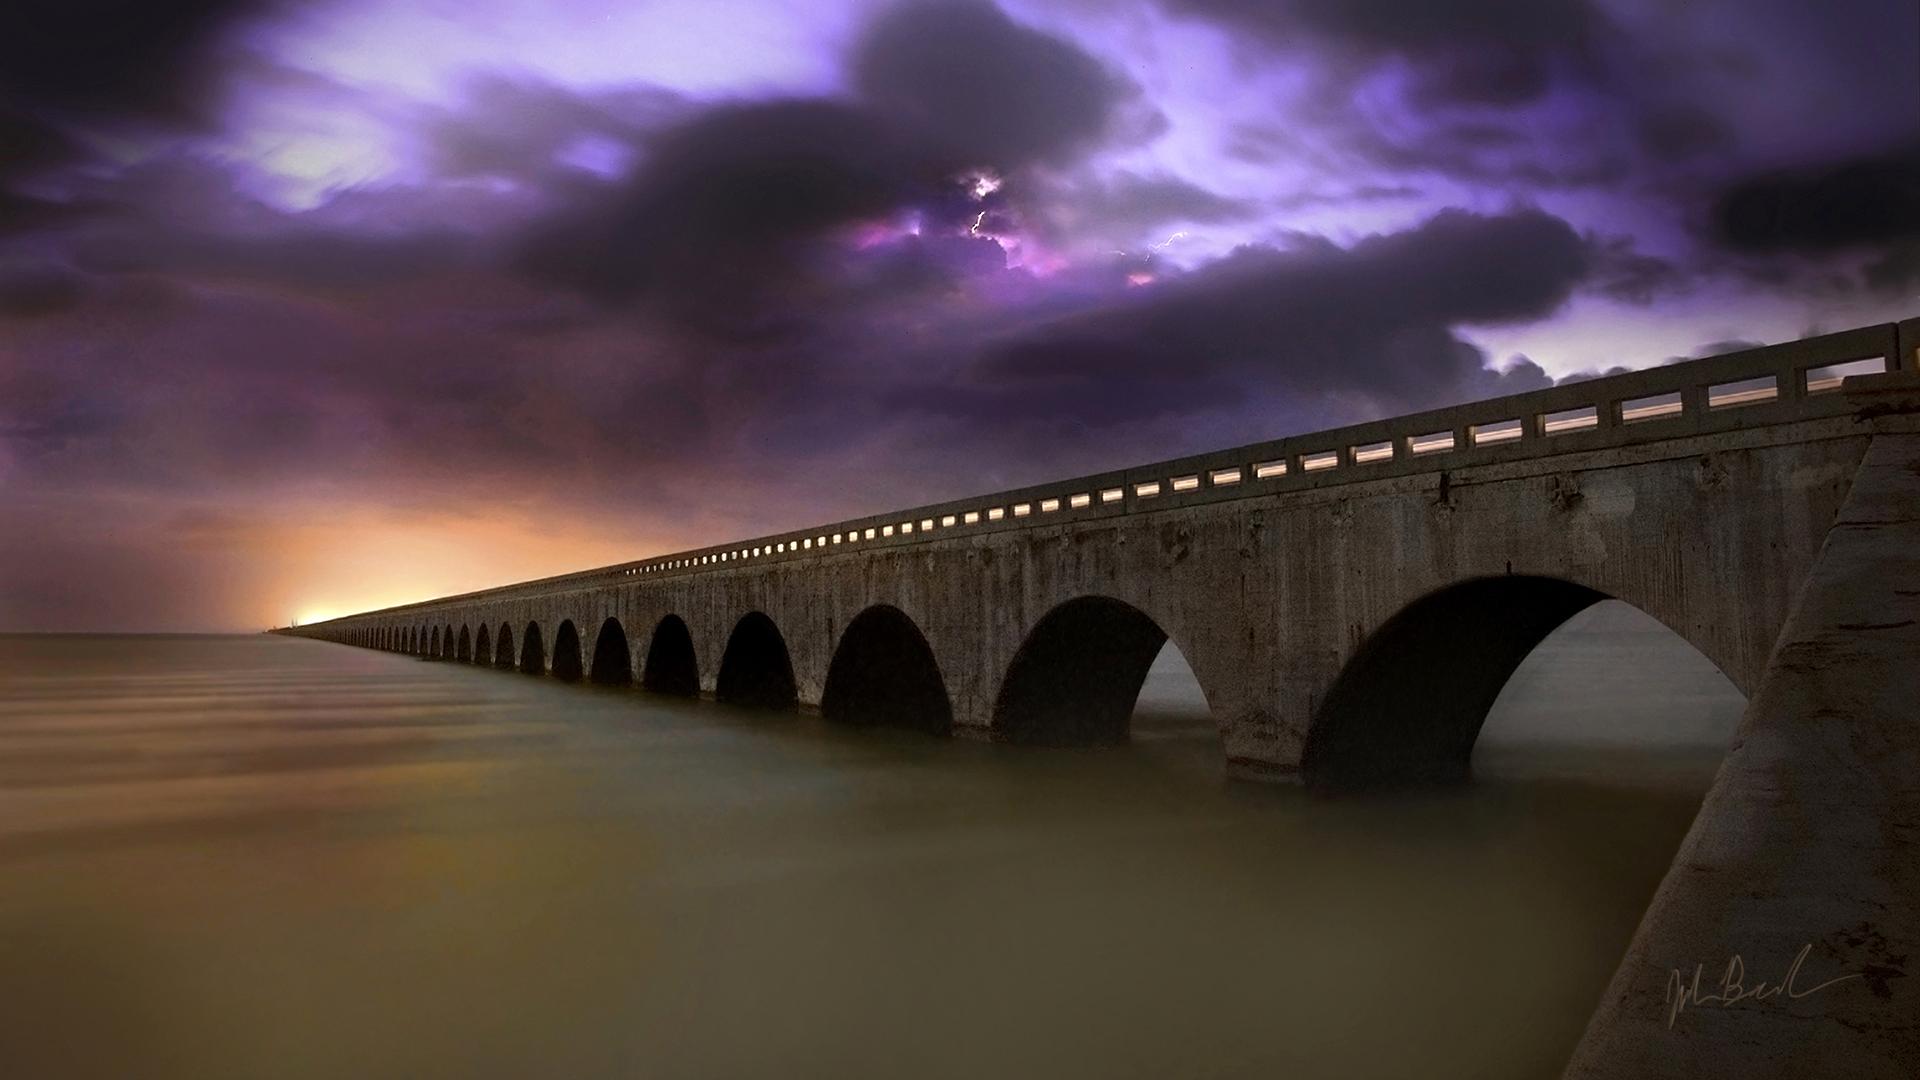 The bridge over the ocean wallpapers and images - Fantasy wallpaper bridge ...